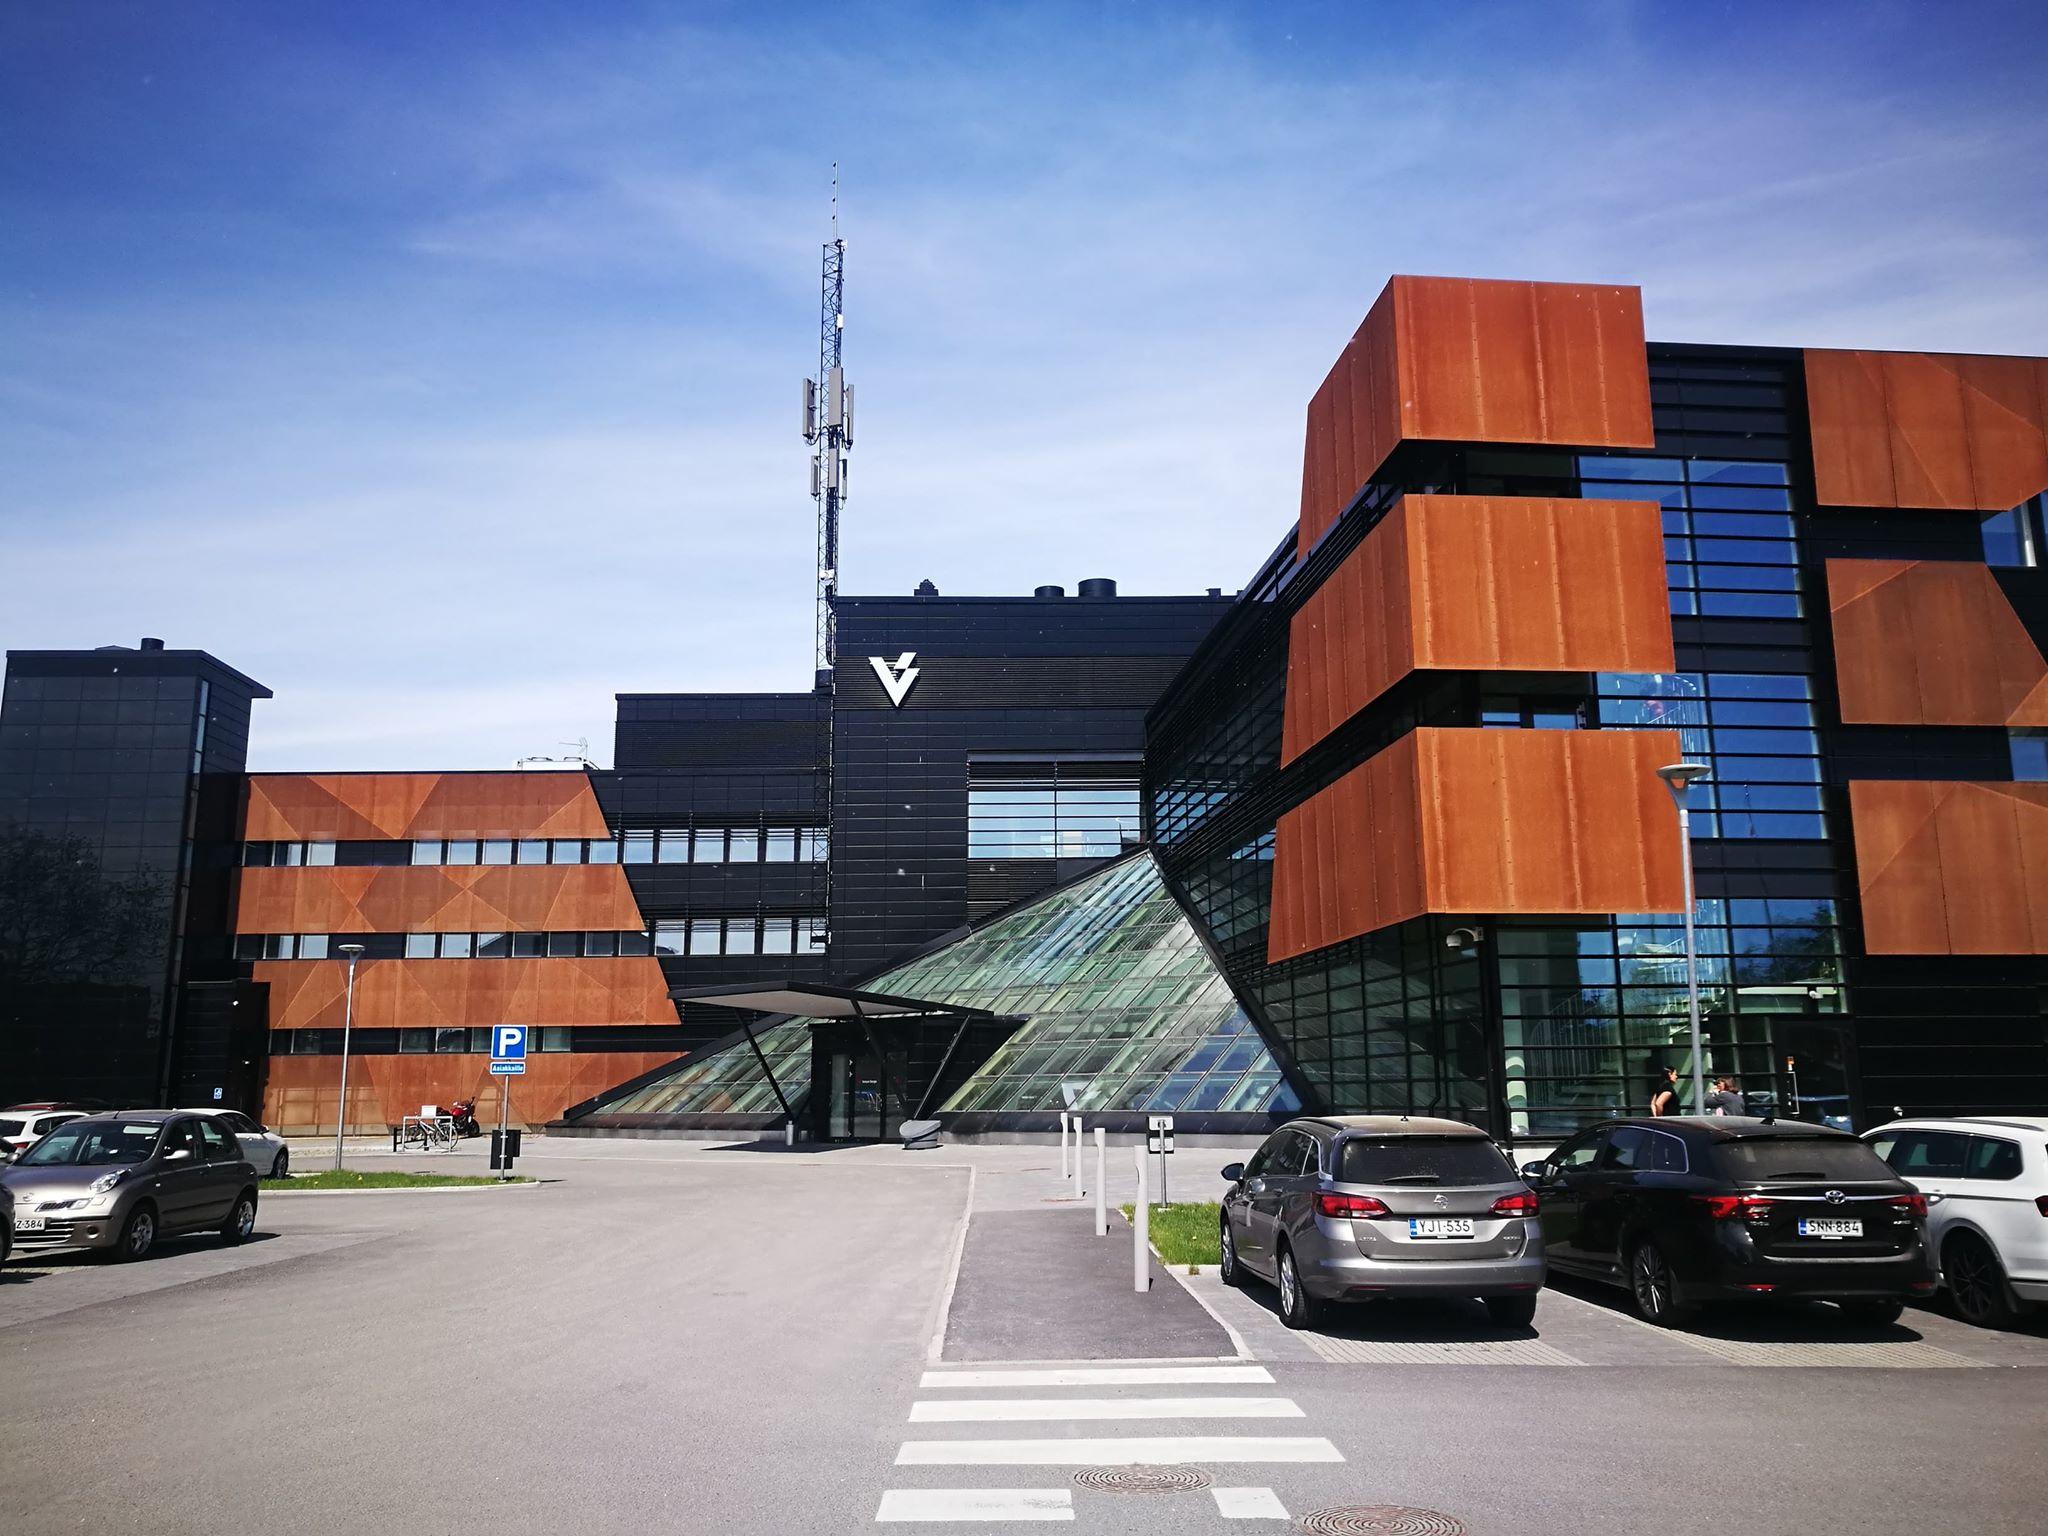 Vantaan Energia - www.vantaanenergia.fi